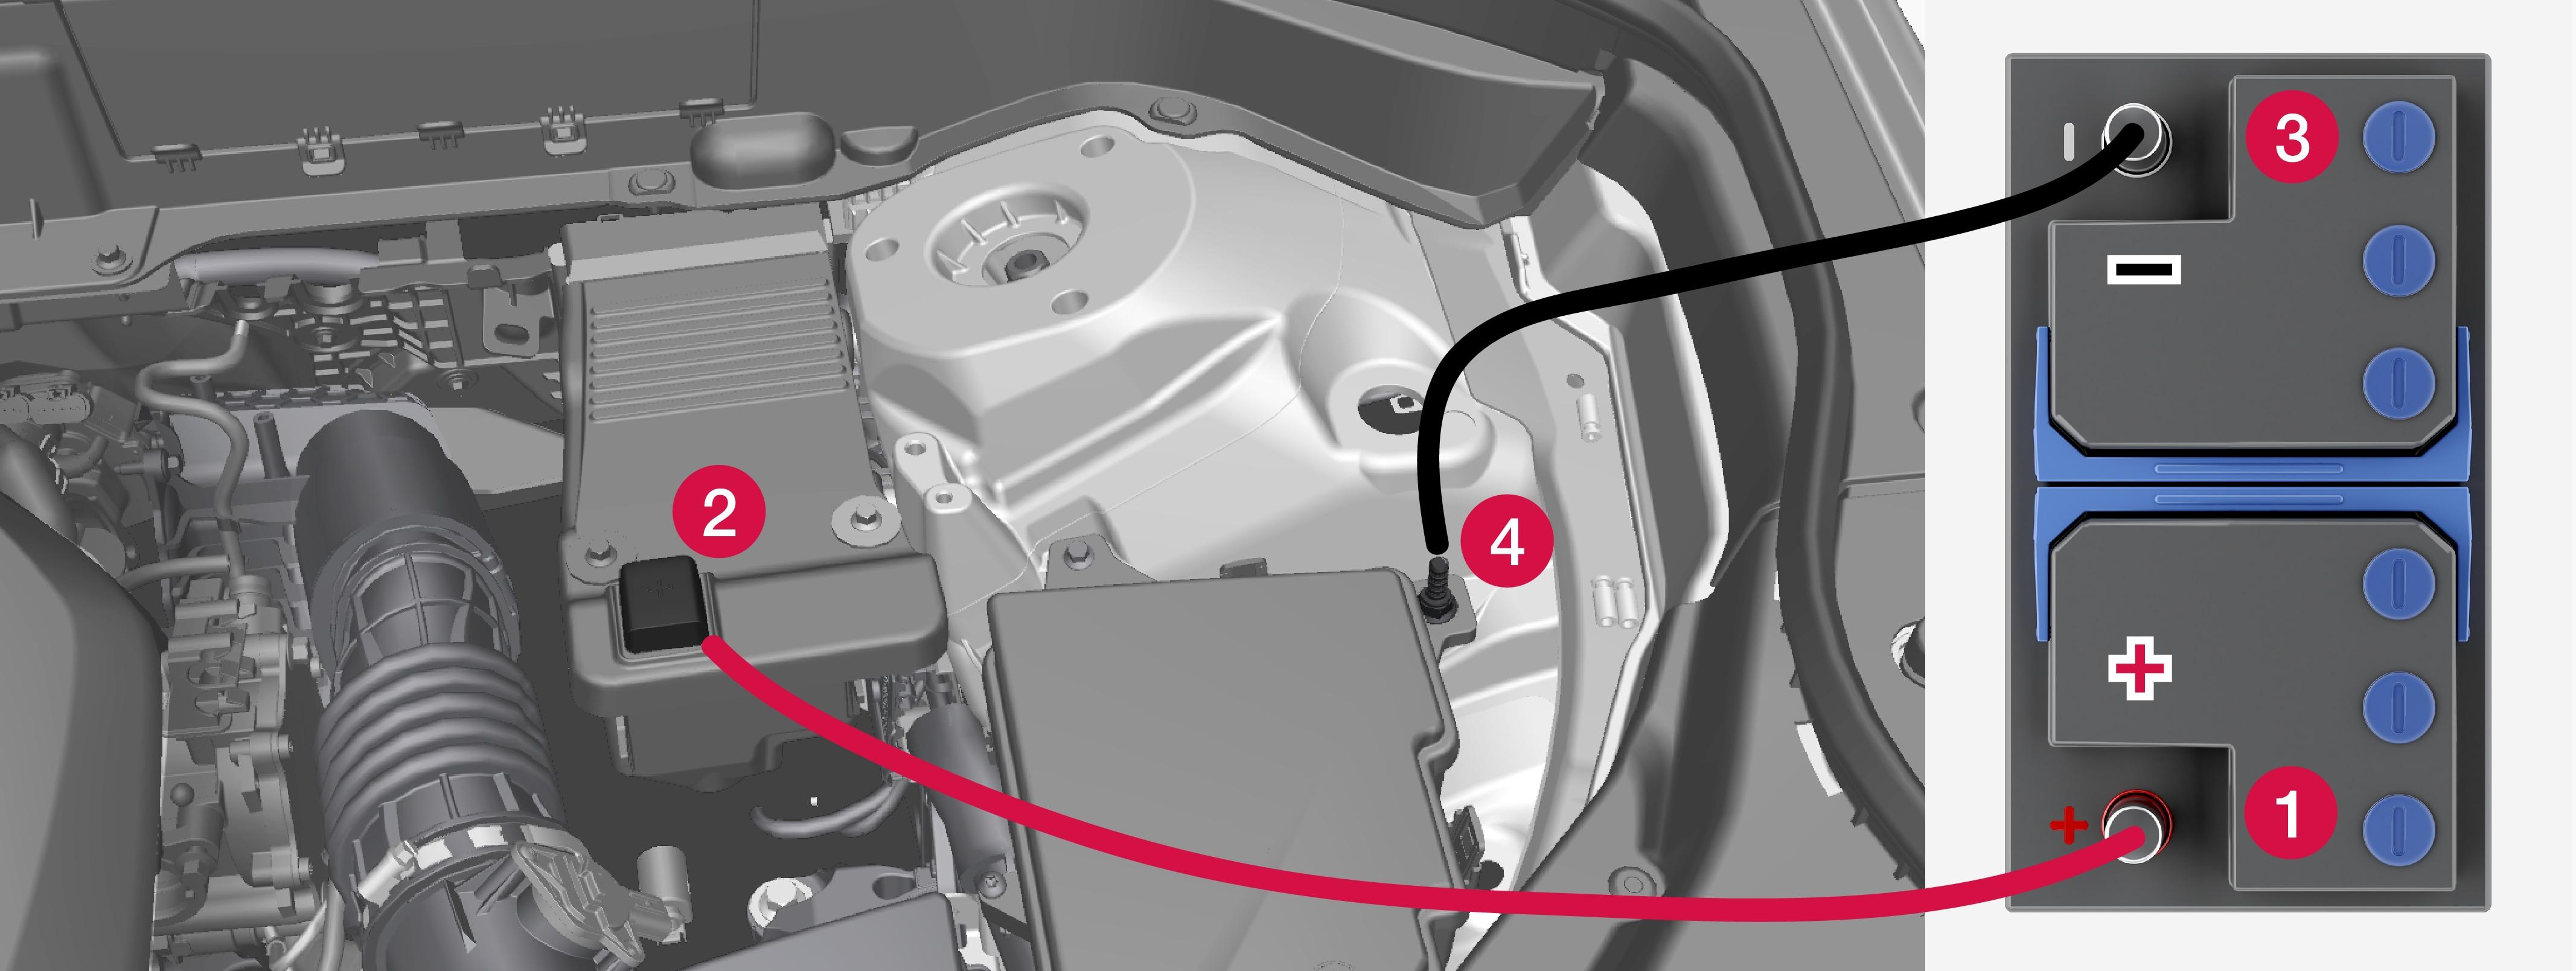 P5-1507-Connect jumper cables